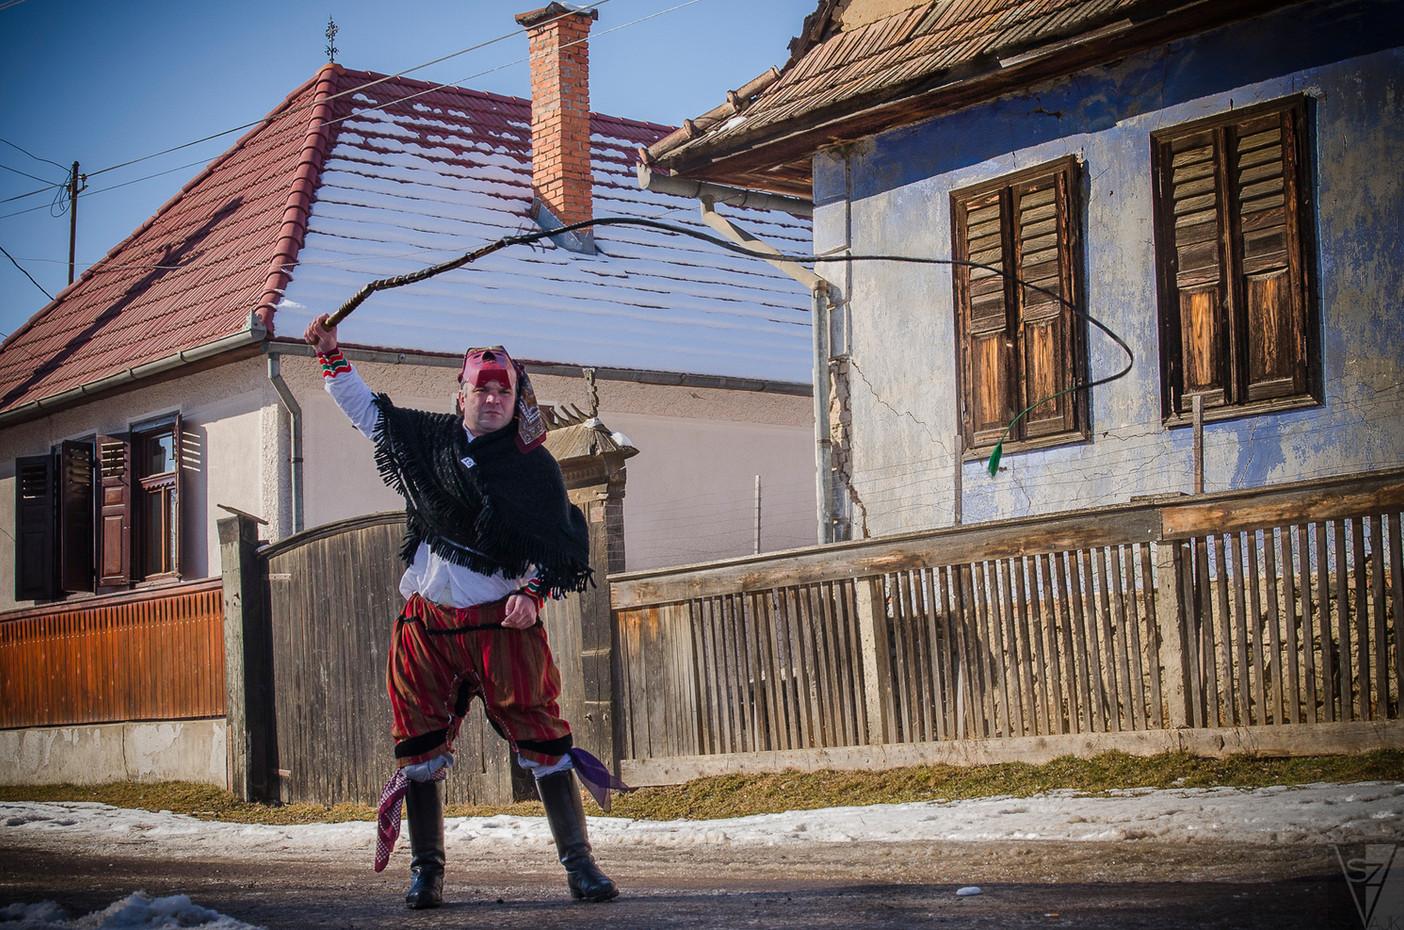 Kászonaltíz / Plăieșii de Jos Harghita county / Hargita megye / Județul Harghita Romania / Románia / România 2015